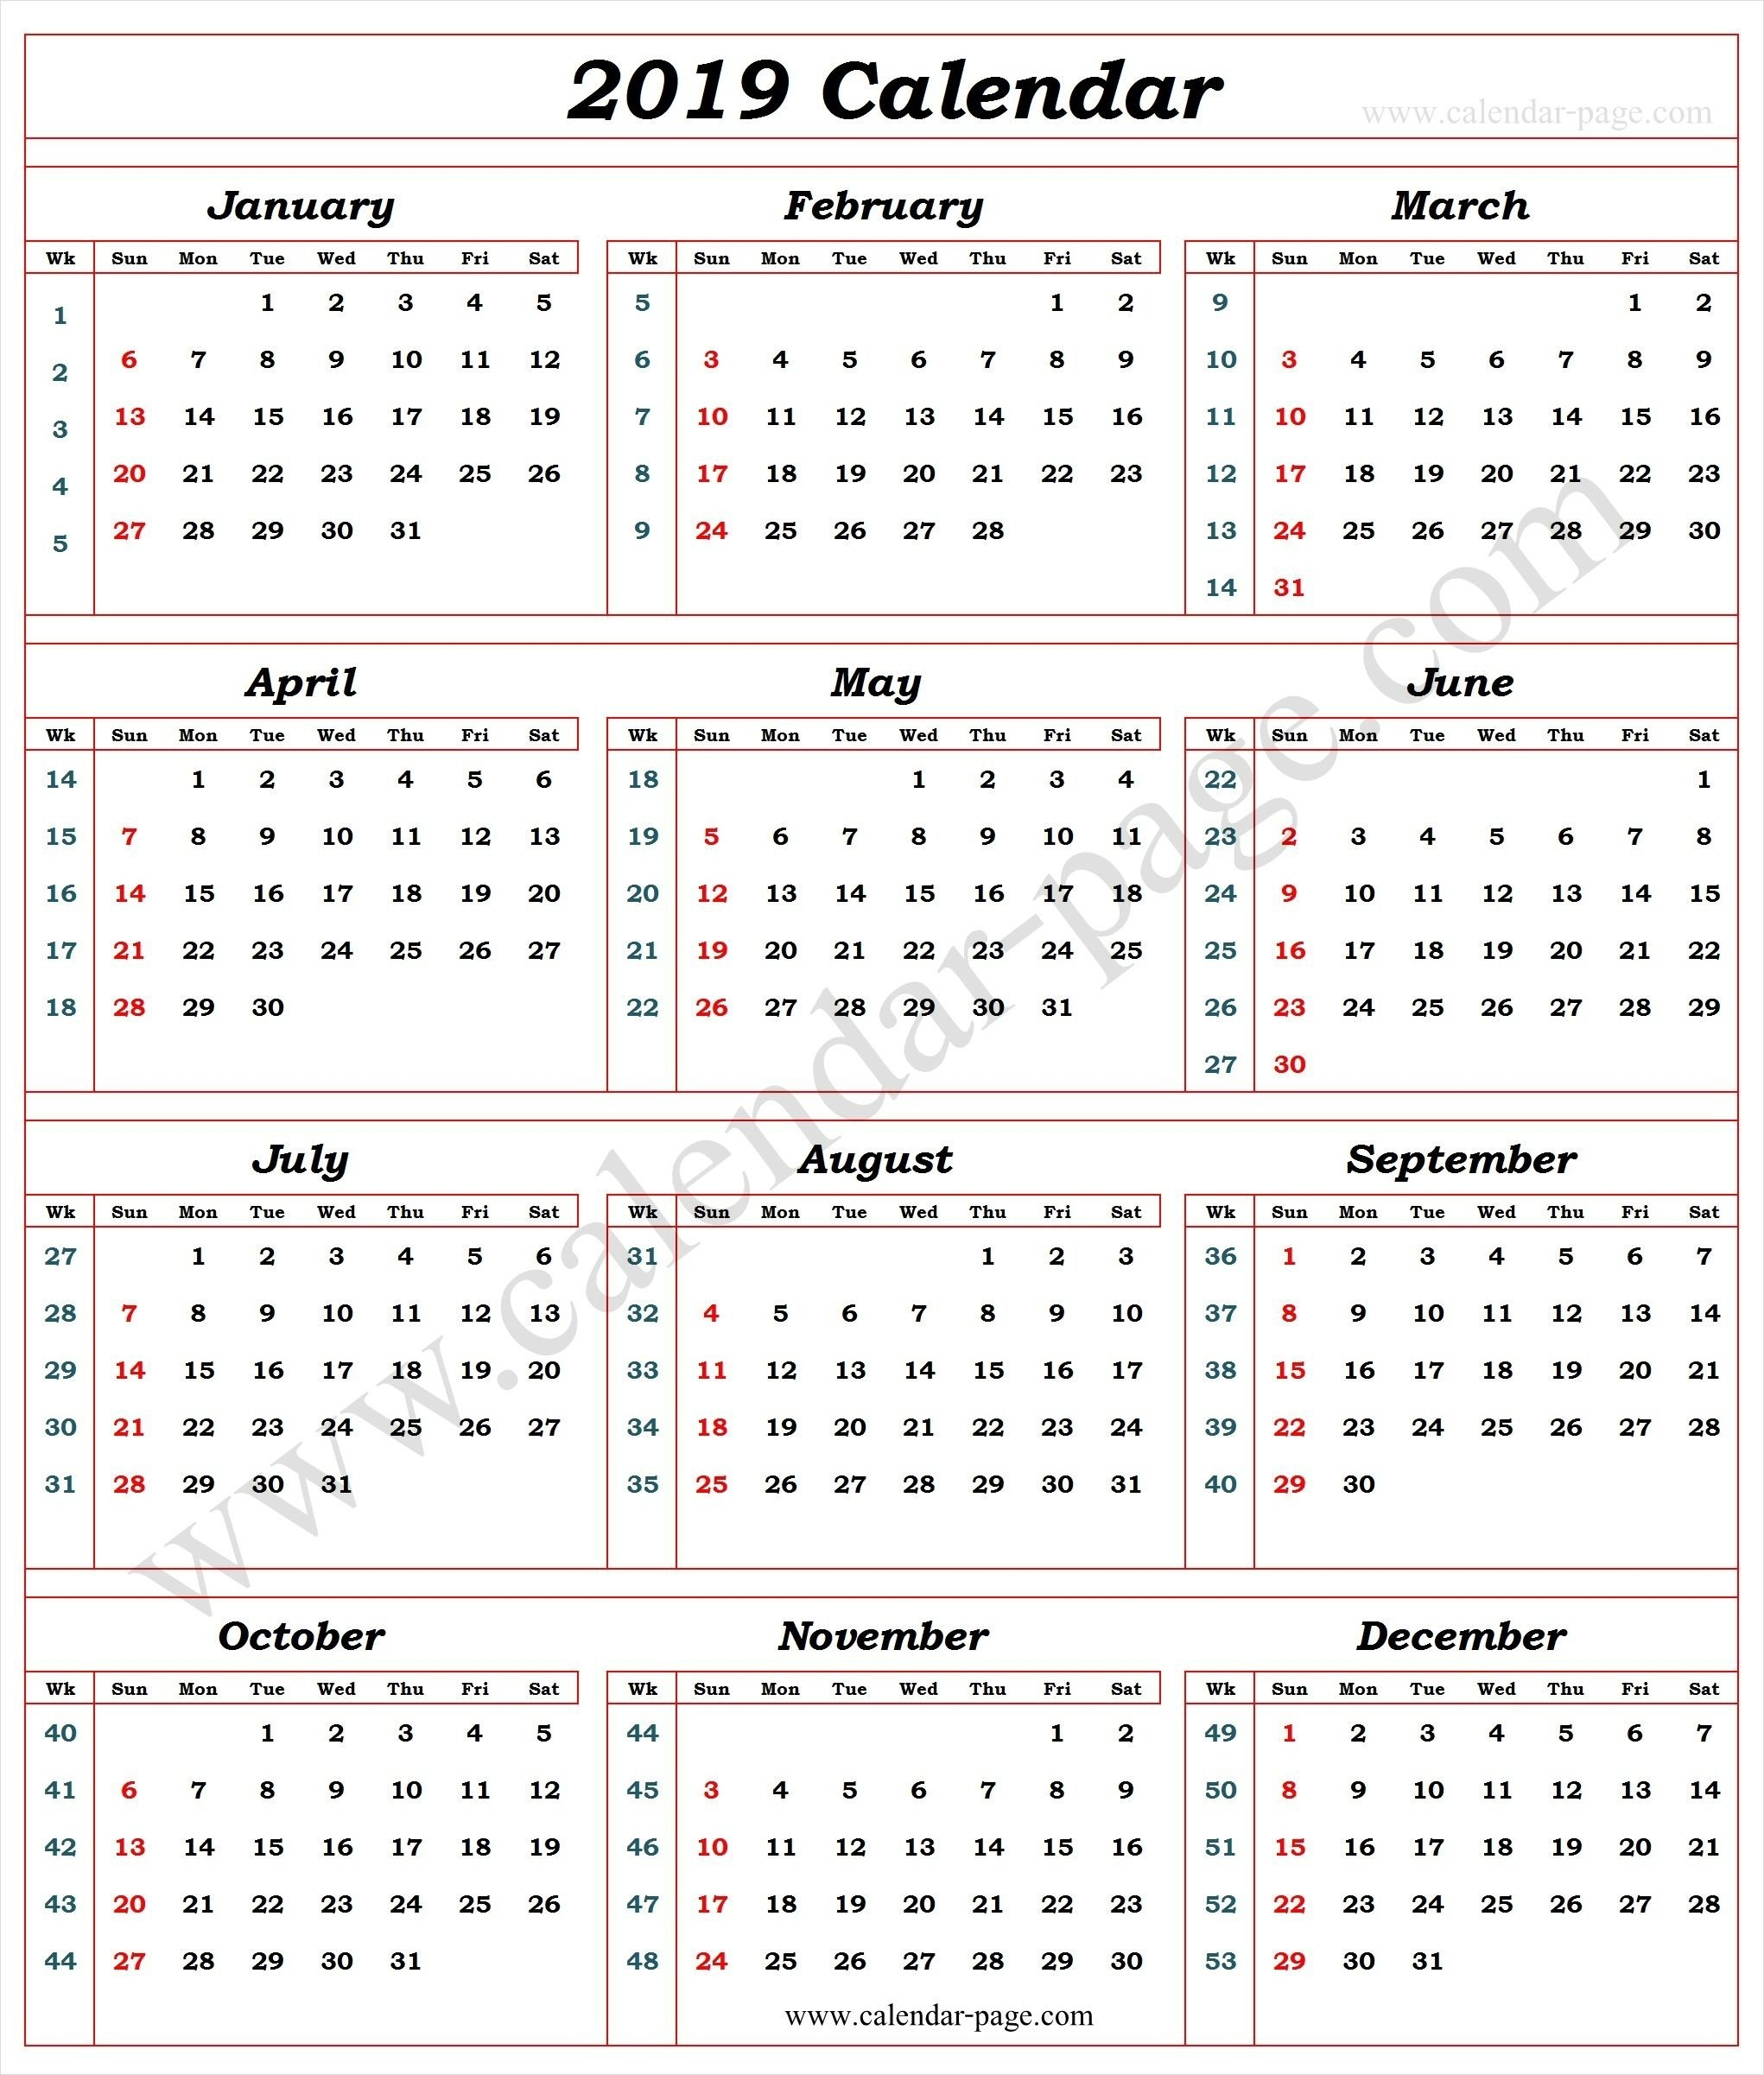 Calendar 2019 With Week Numbers   2019 Calendar Template   Pinterest Calendar Week 4 2019